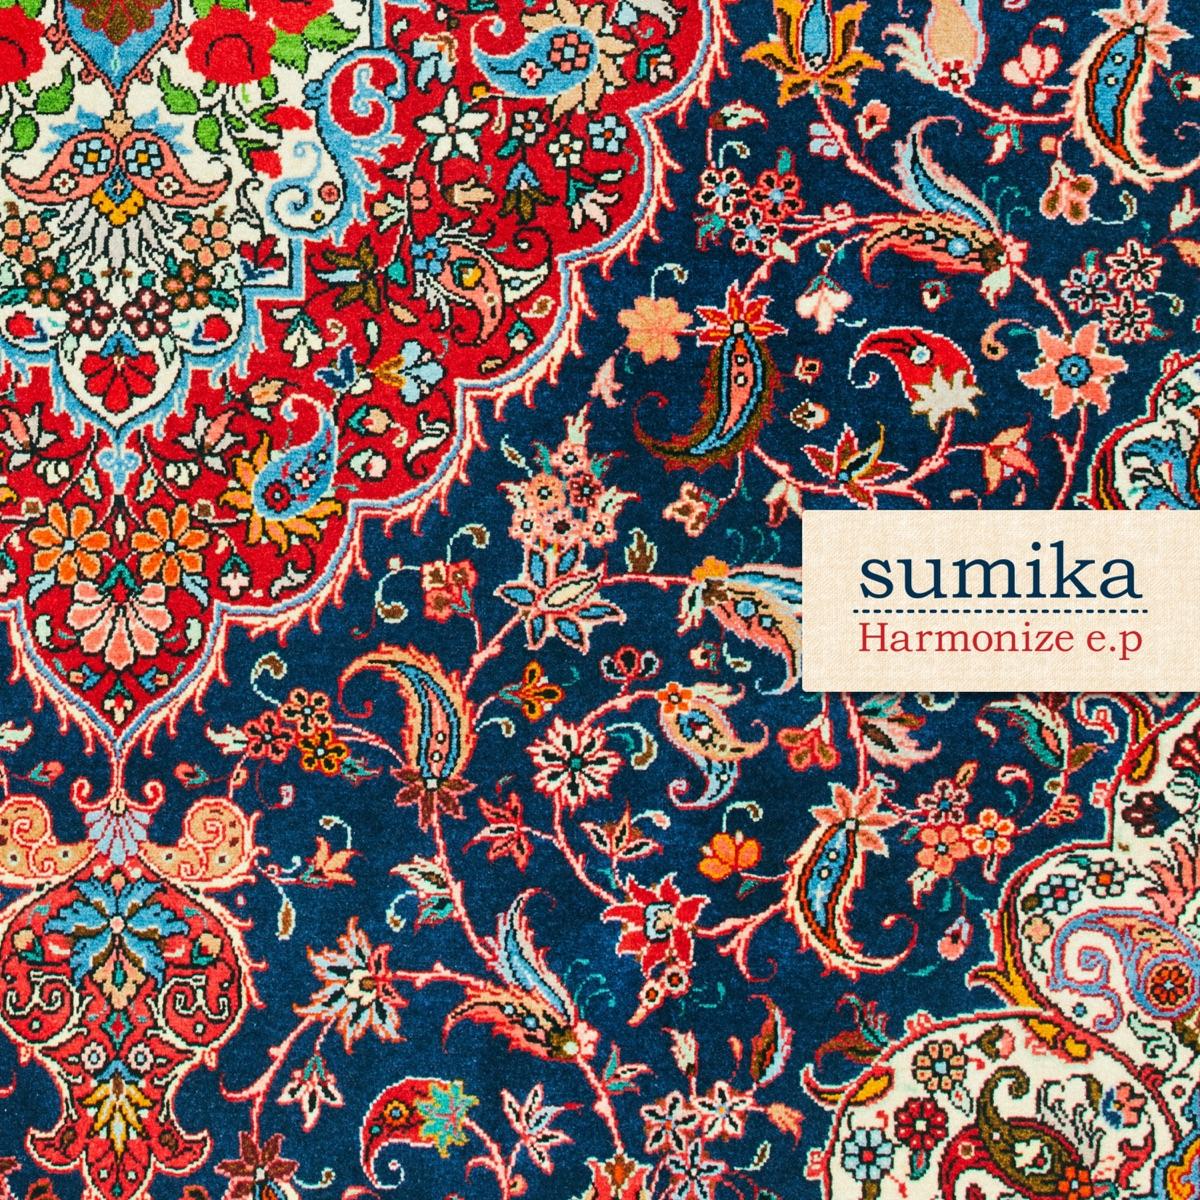 『sumikaセンス・オブ・ワンダー』収録の『Harmonize e.p』ジャケット